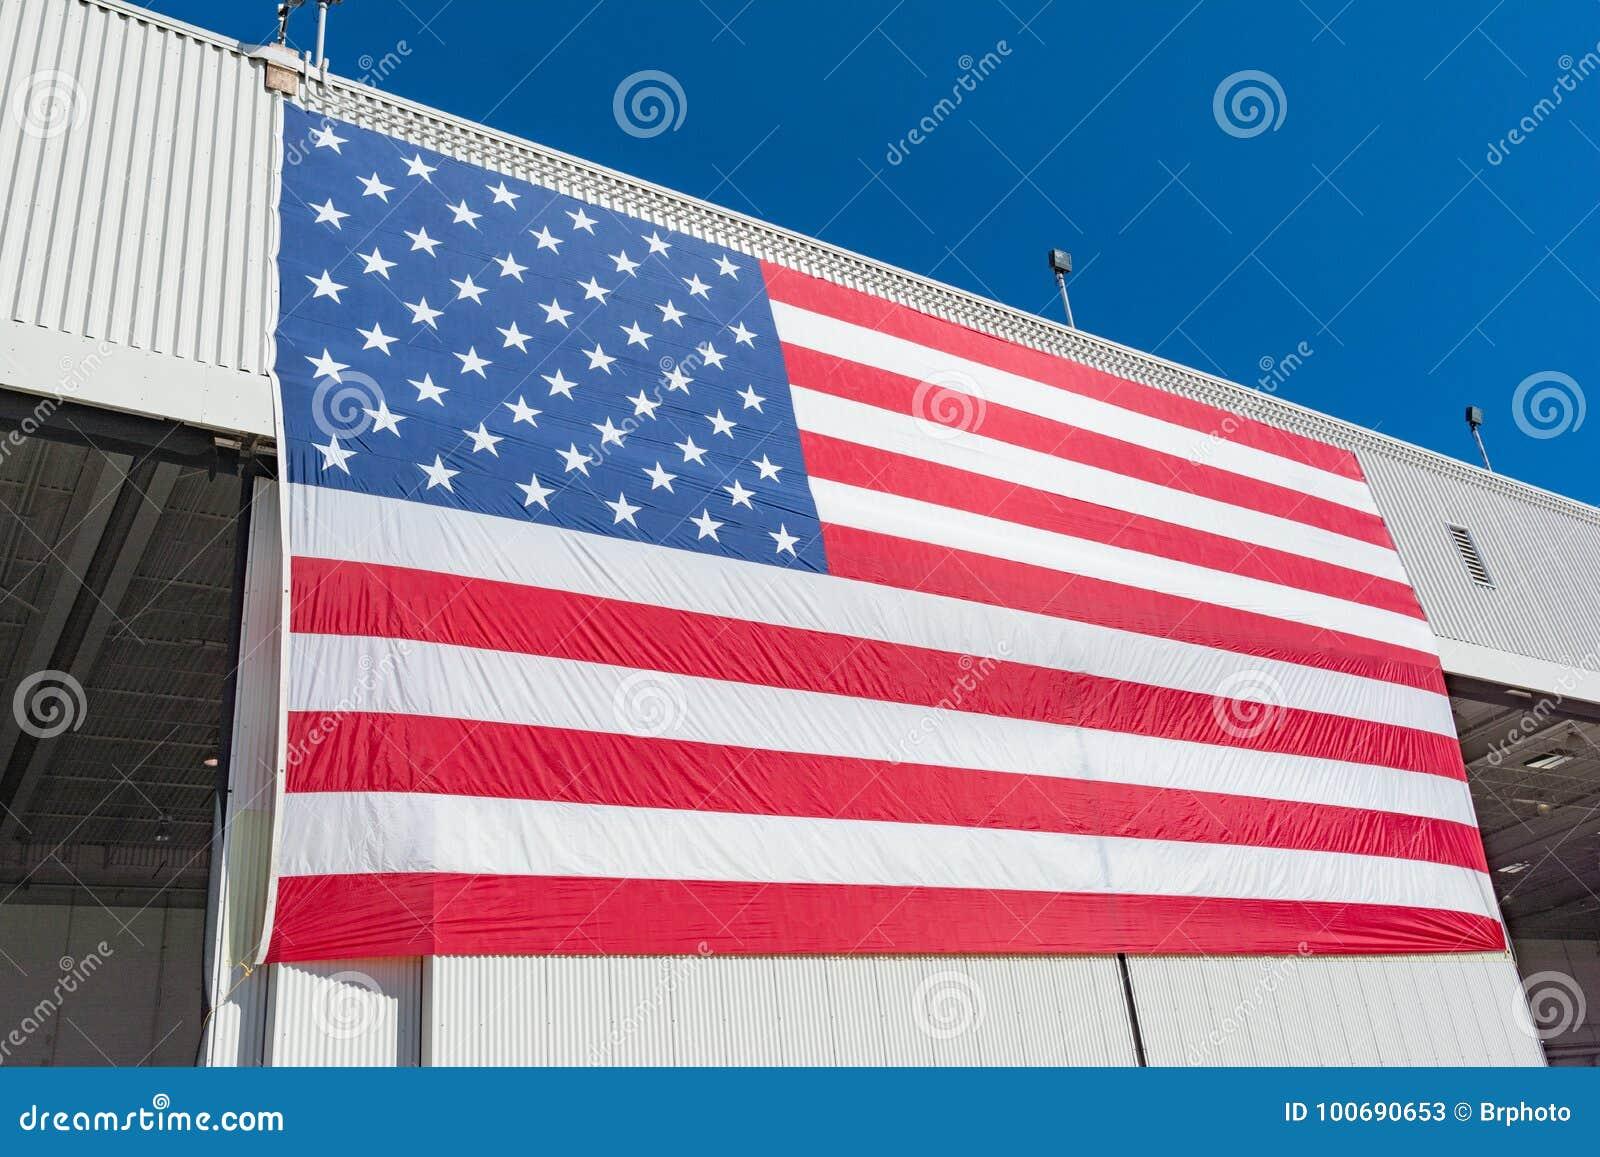 Große amerikanische Flagge an der Miramar-Flugschau